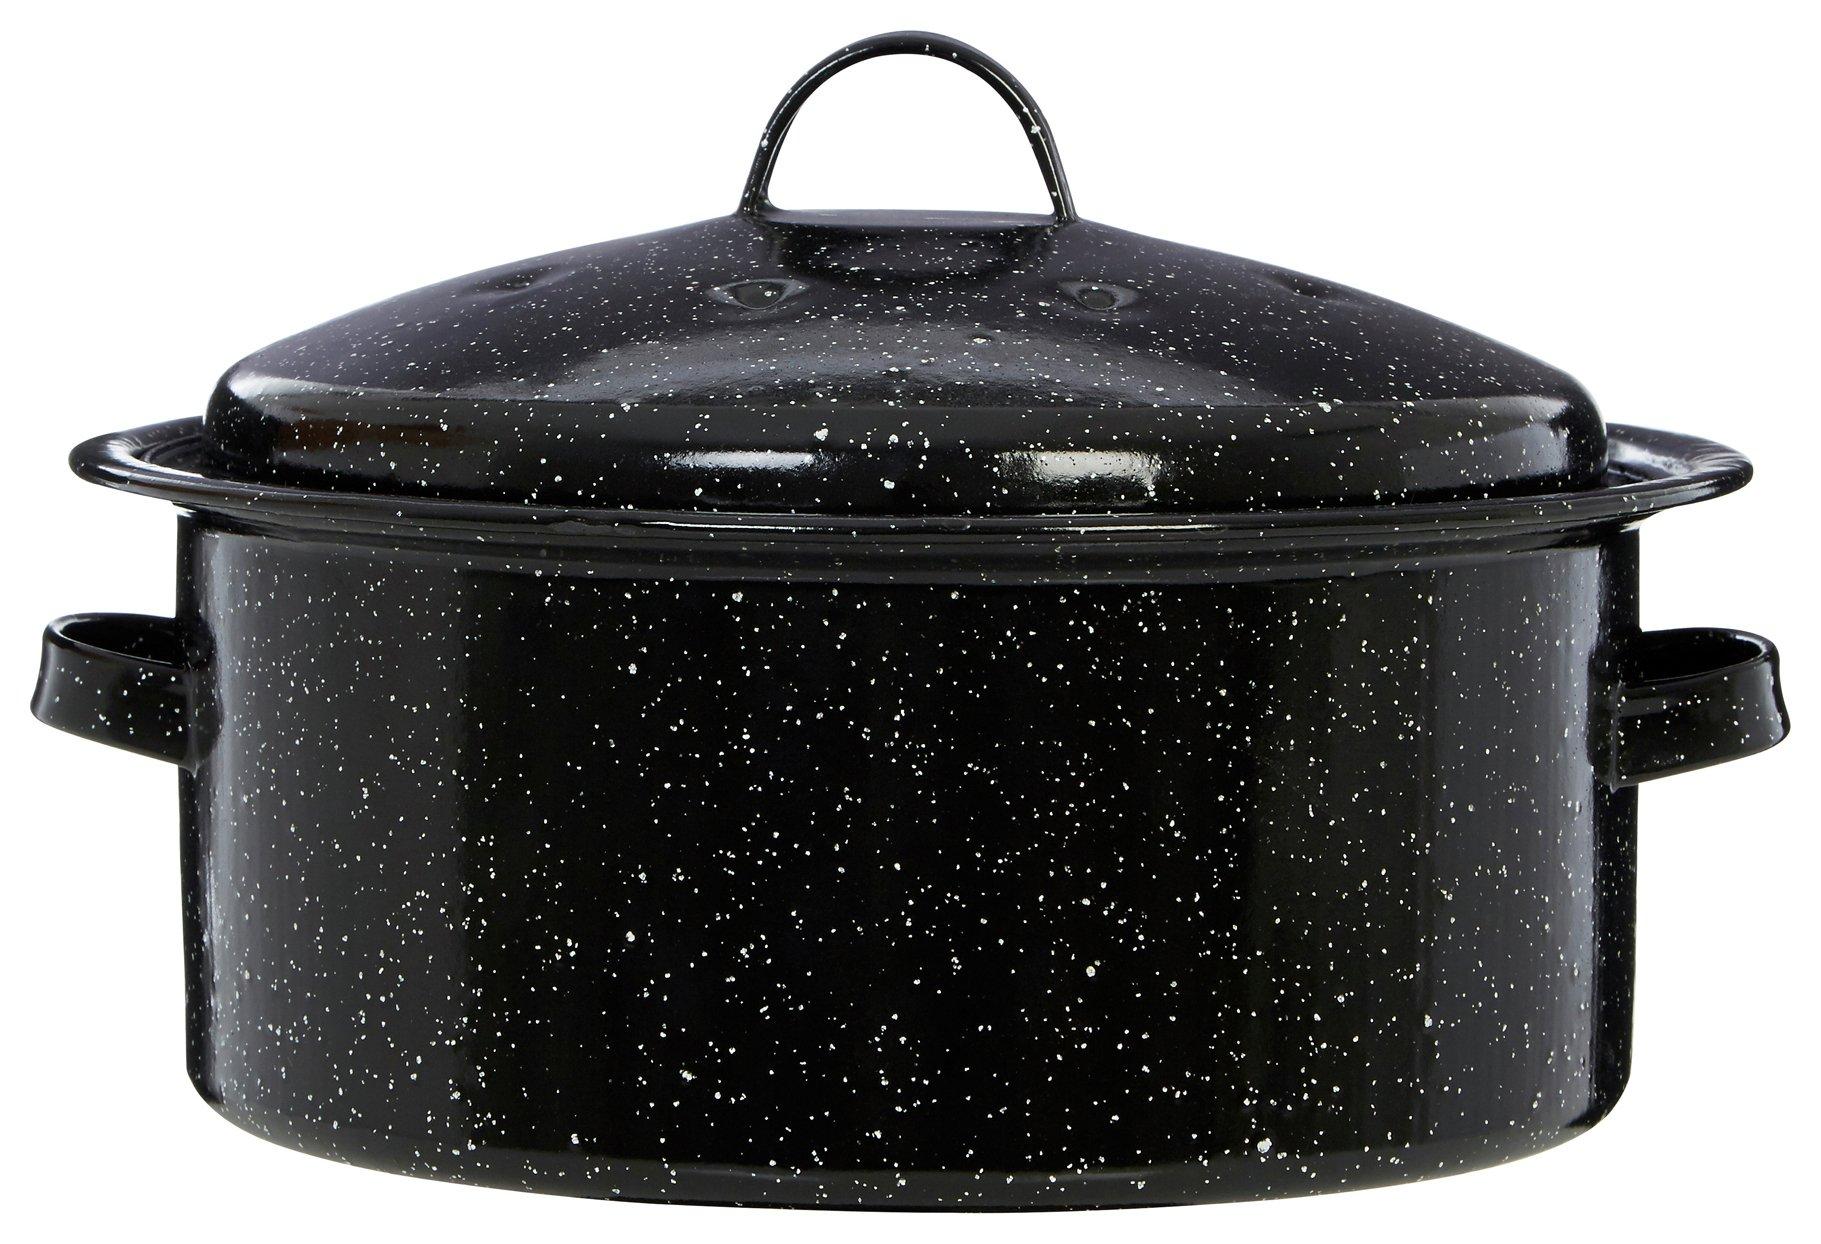 Image of Premier Housewares Enamel 28cm Black Round Roaster with Lid.